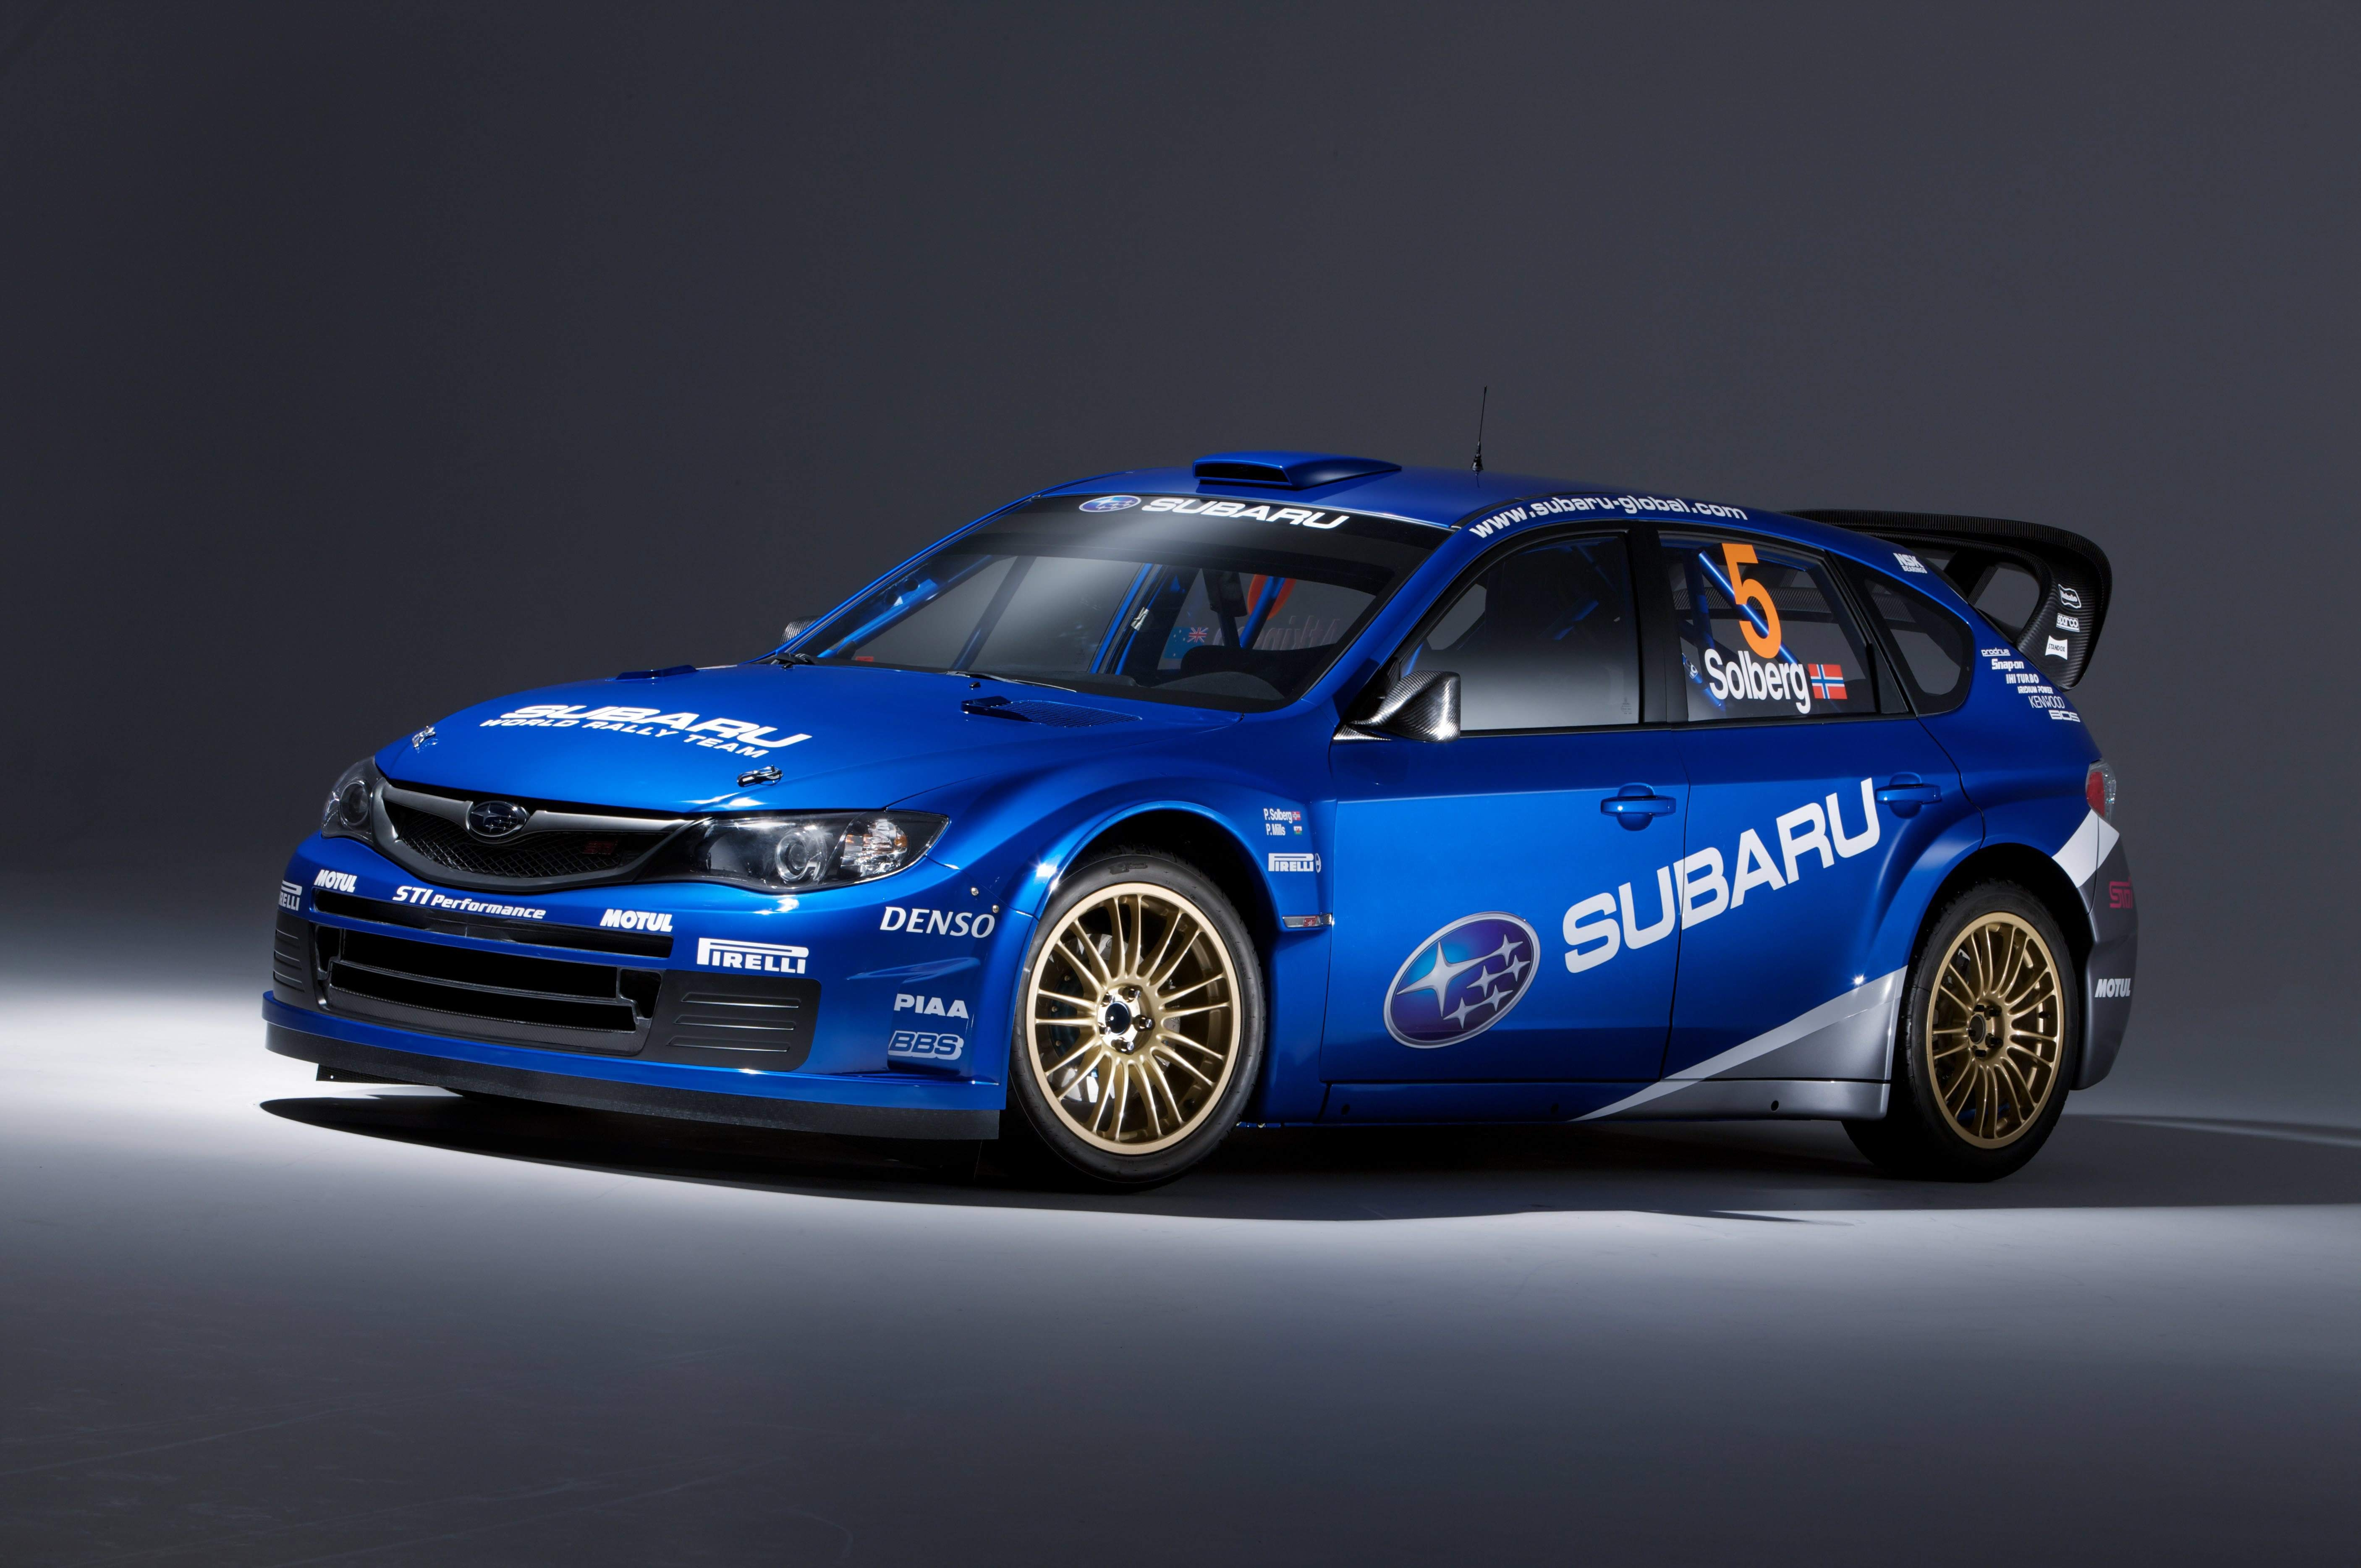 Subaru_Impreza_WRC_2008.JPG